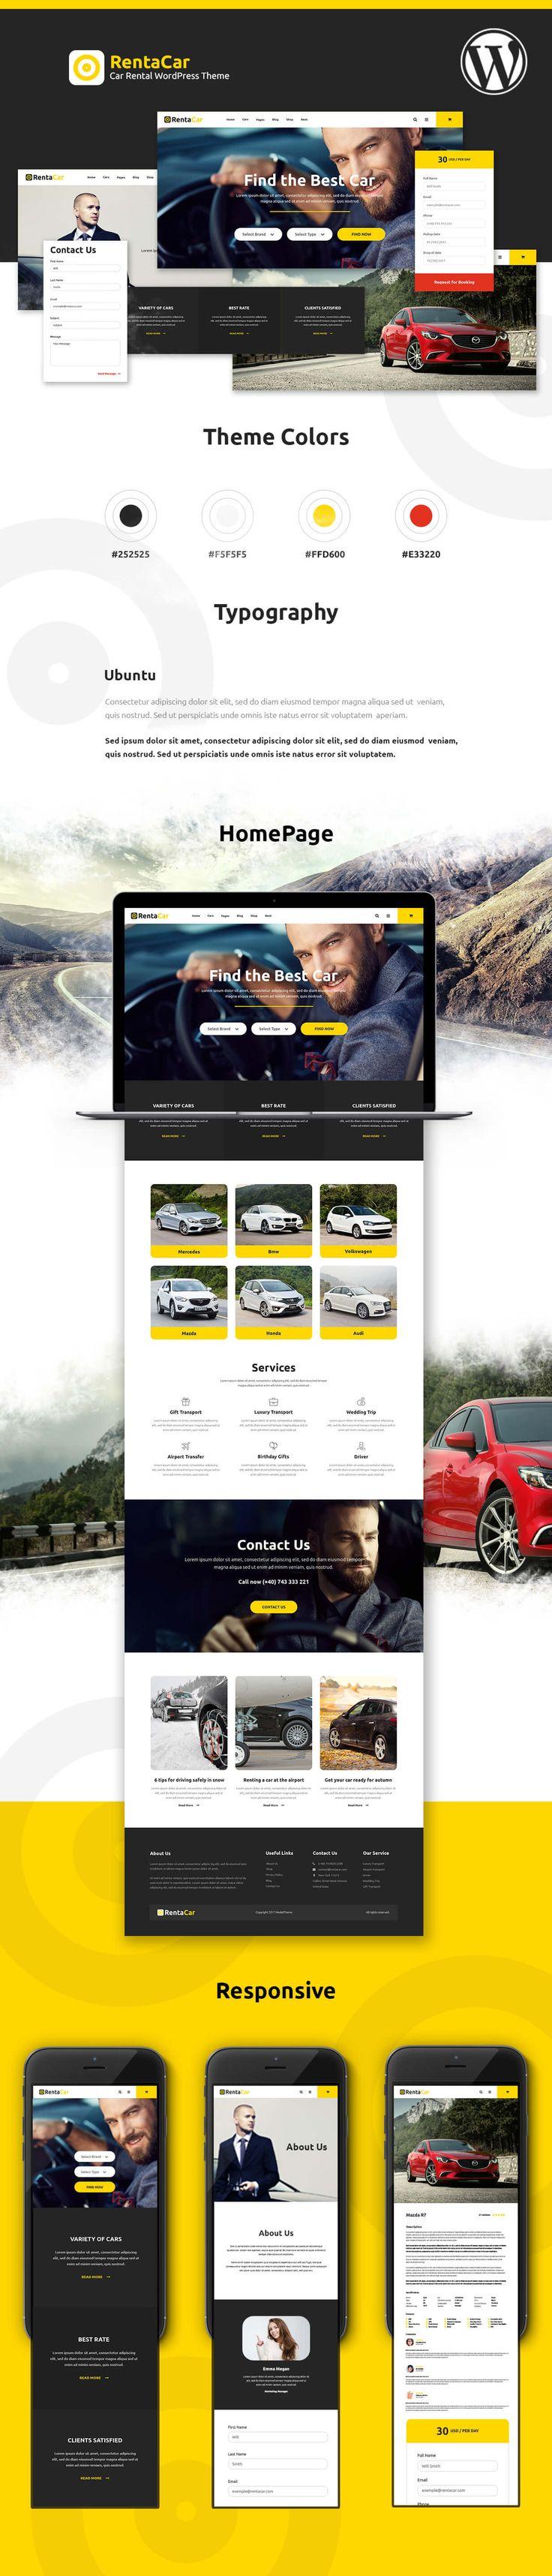 Rentacar - Car Rental / Listing WordPress Theme by modeltheme   ThemeForest